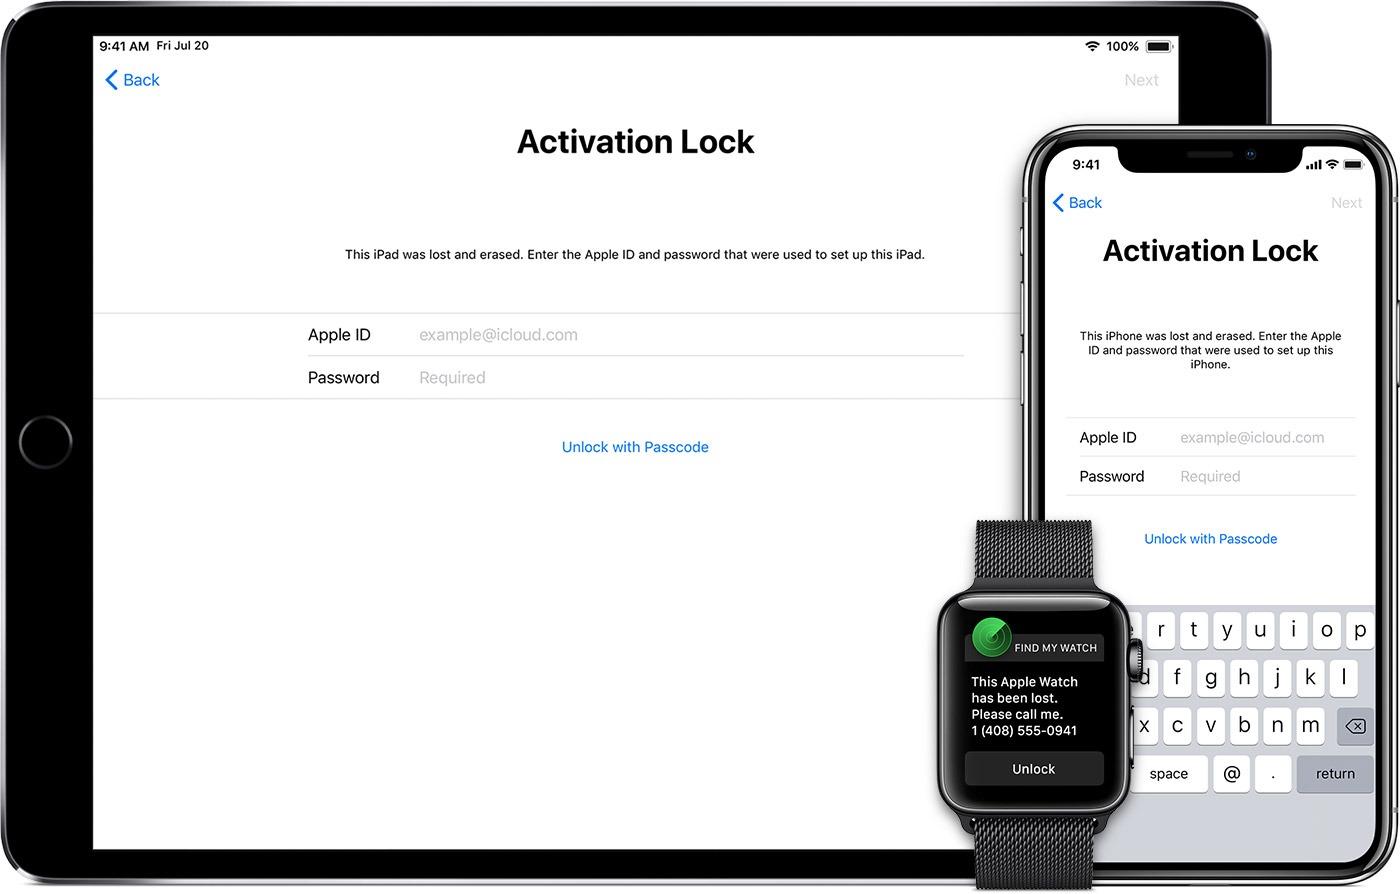 ios12-ipad-pro-iphone-x-watch-activation-lock-hero